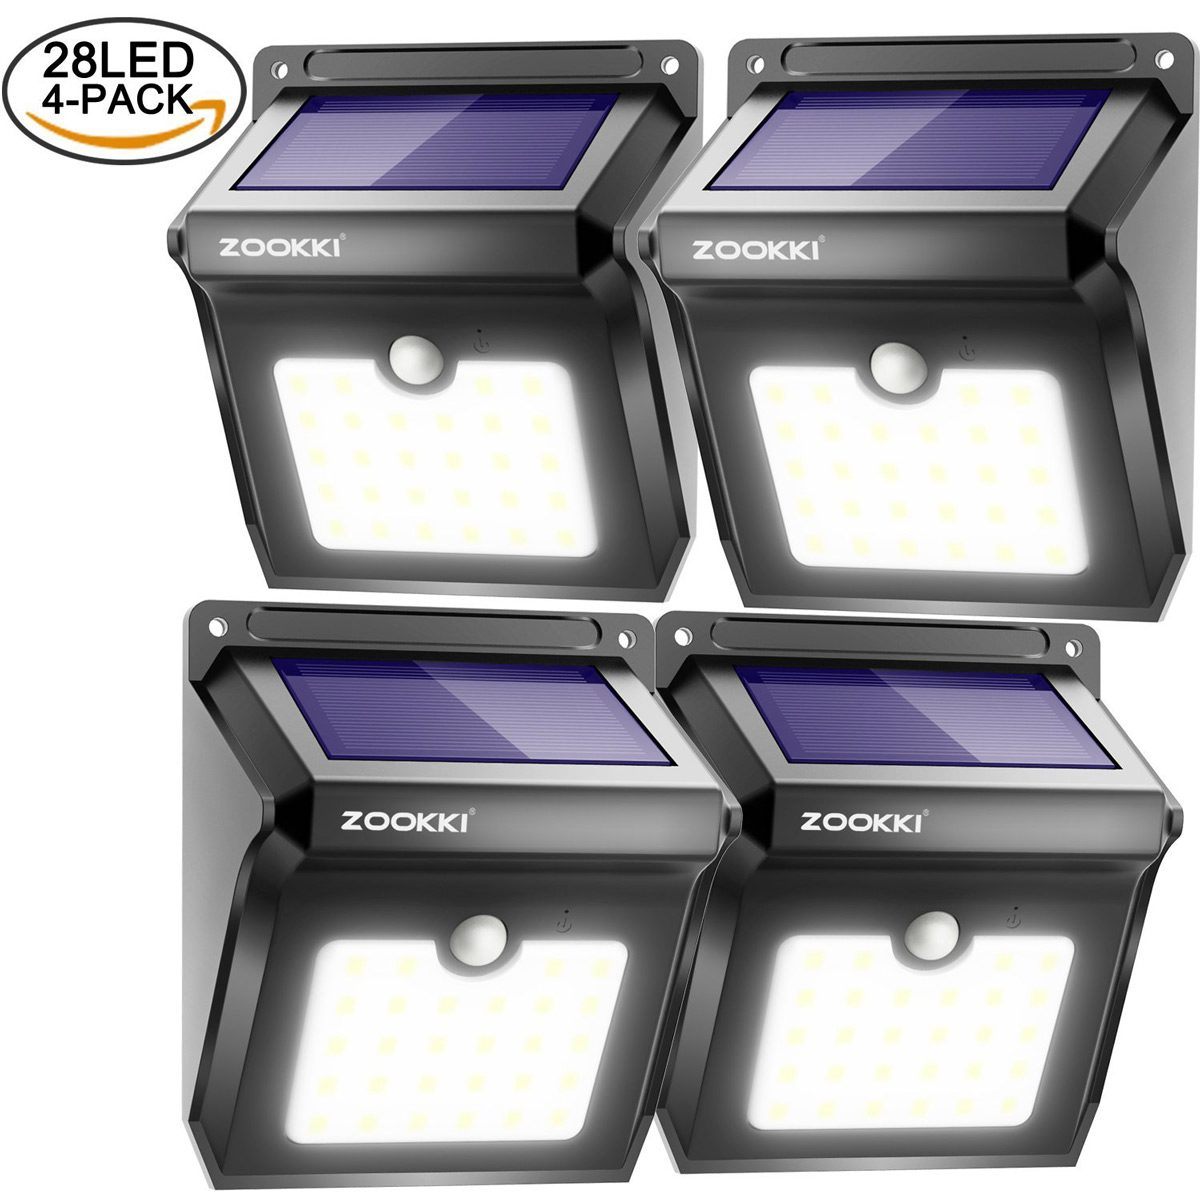 Zookki LED Wireless Solar Motion Sensor Lights